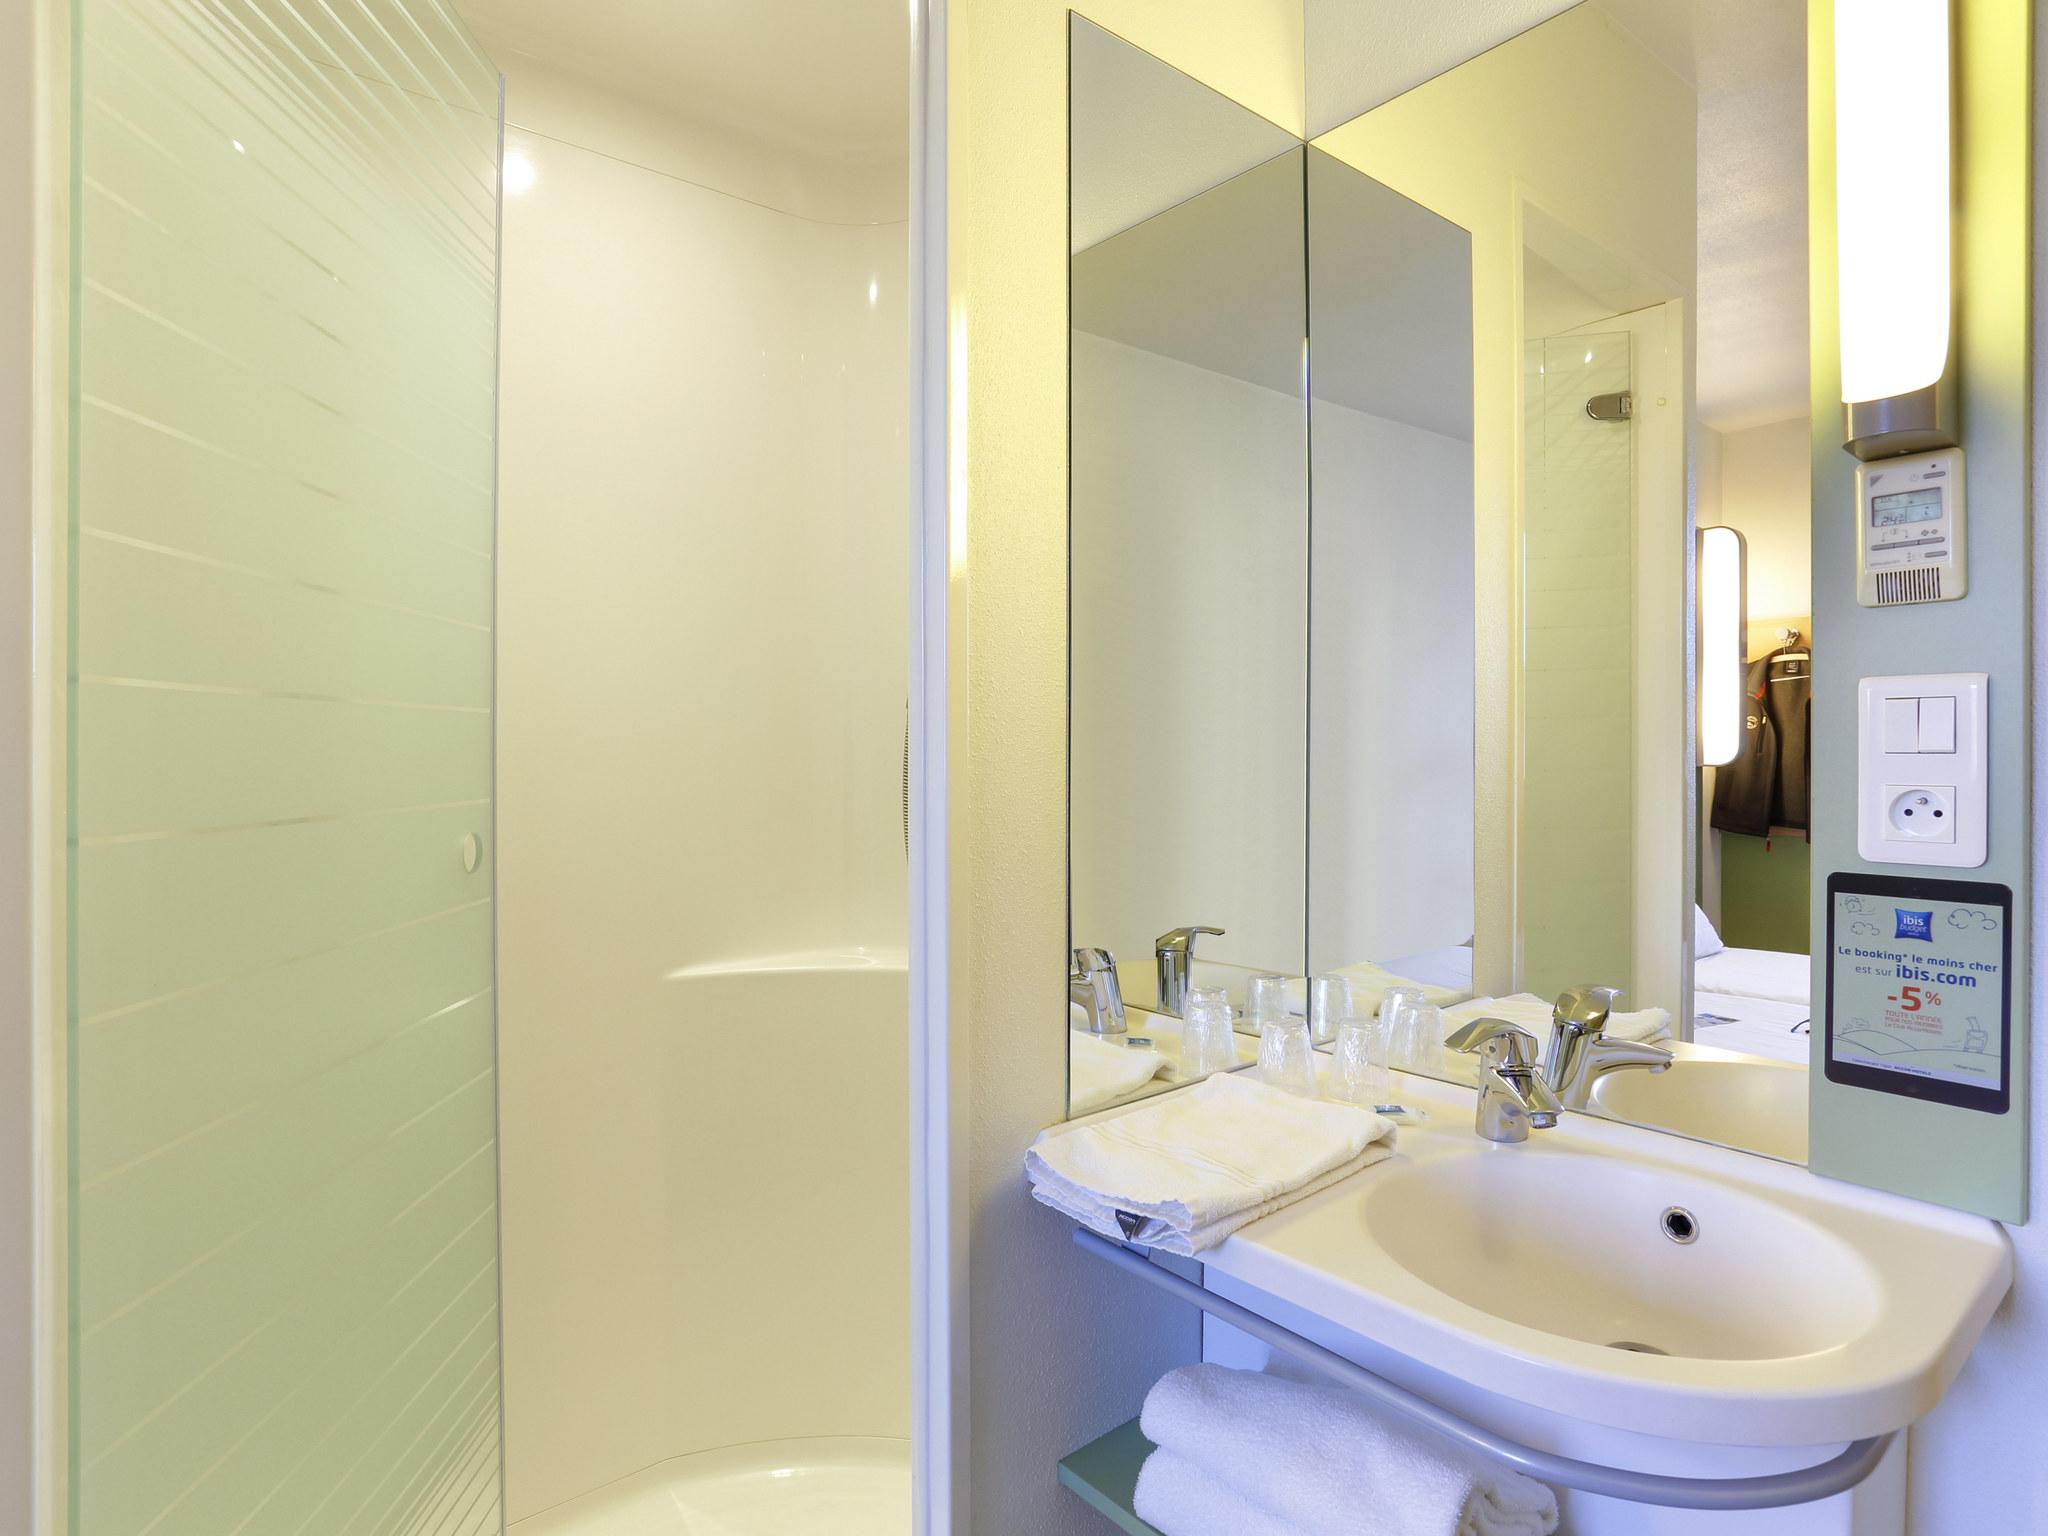 hotel in apt ibis budget apt luberon. Black Bedroom Furniture Sets. Home Design Ideas